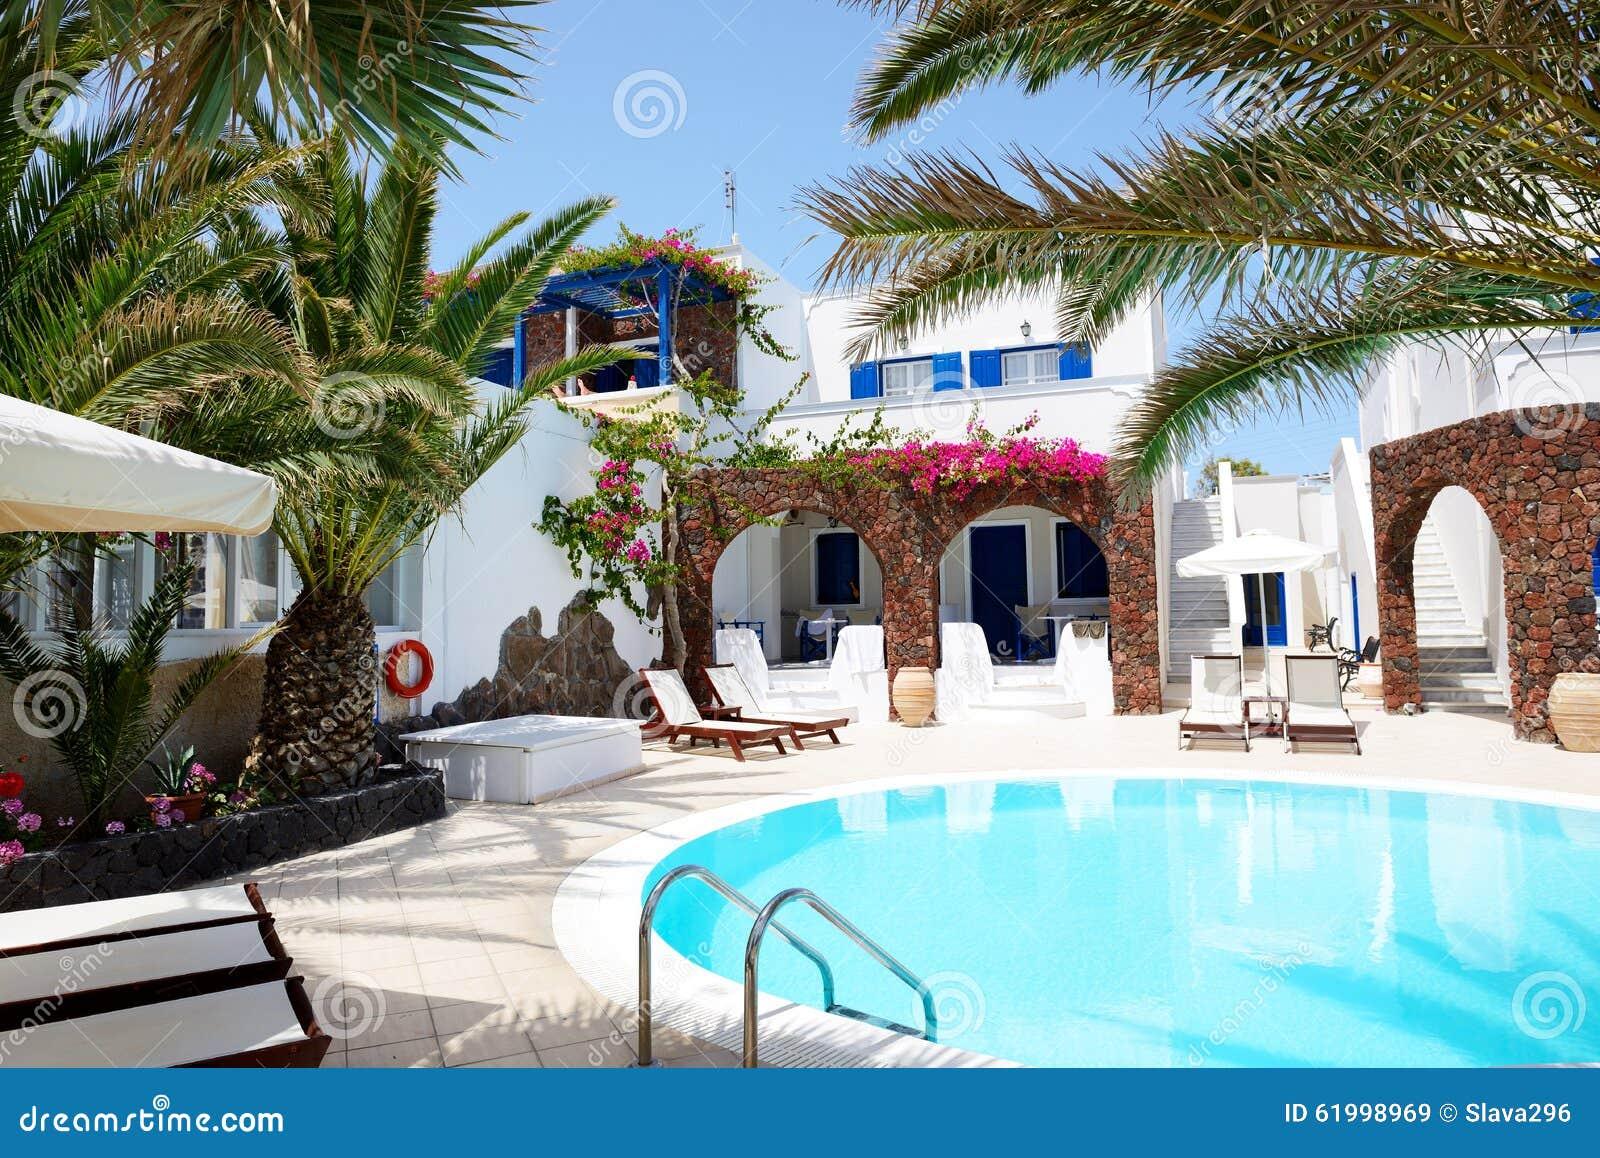 Piscine d 39 h tel dans le style grec traditionnel image for Piscine d hotel